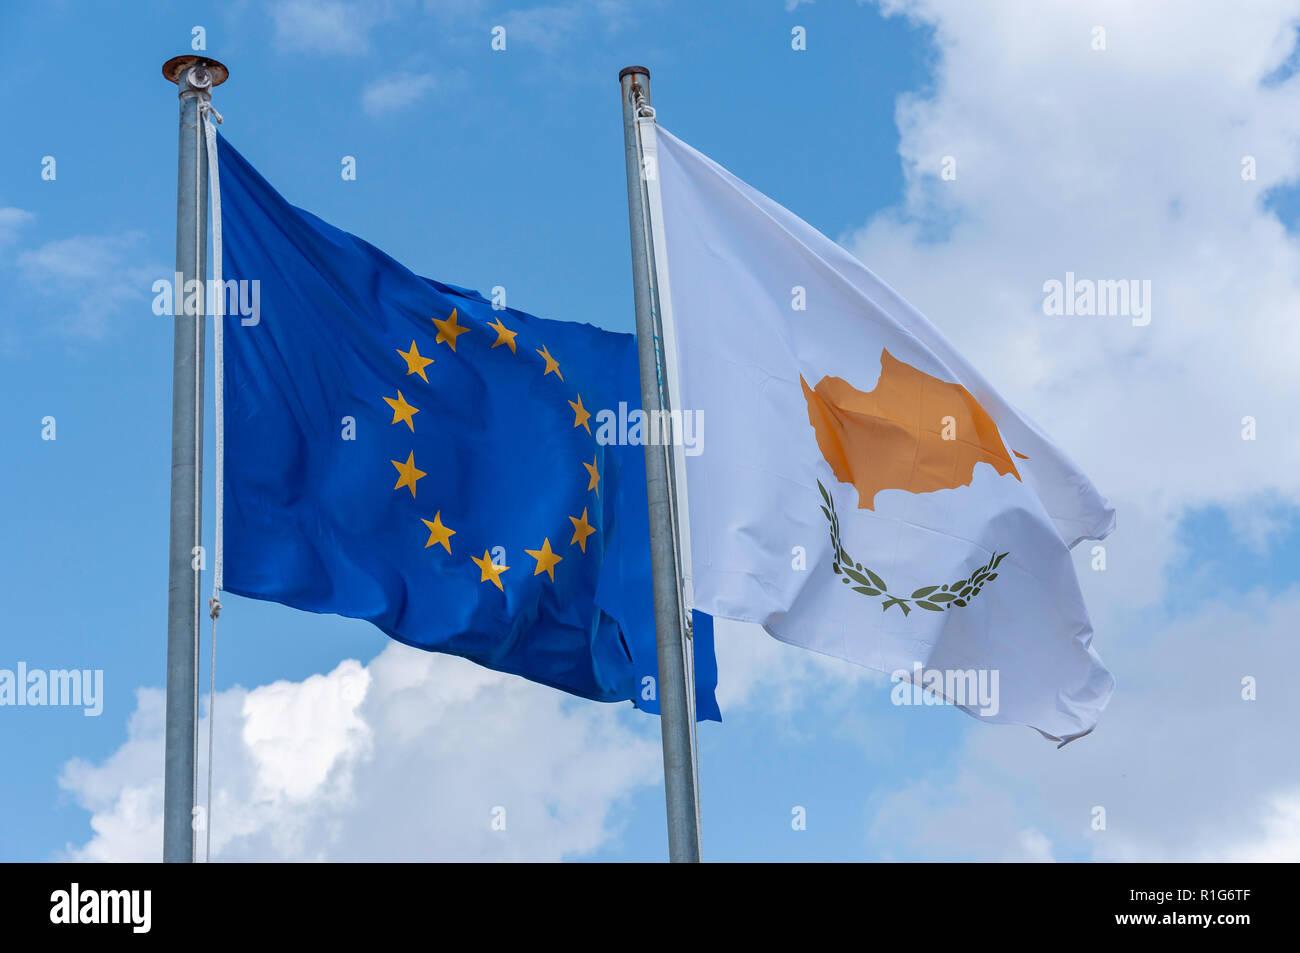 The European Union and Cyprus flag flying on flagpole, Kouklia, Pafos District, Republic of Cyprus Stock Photo